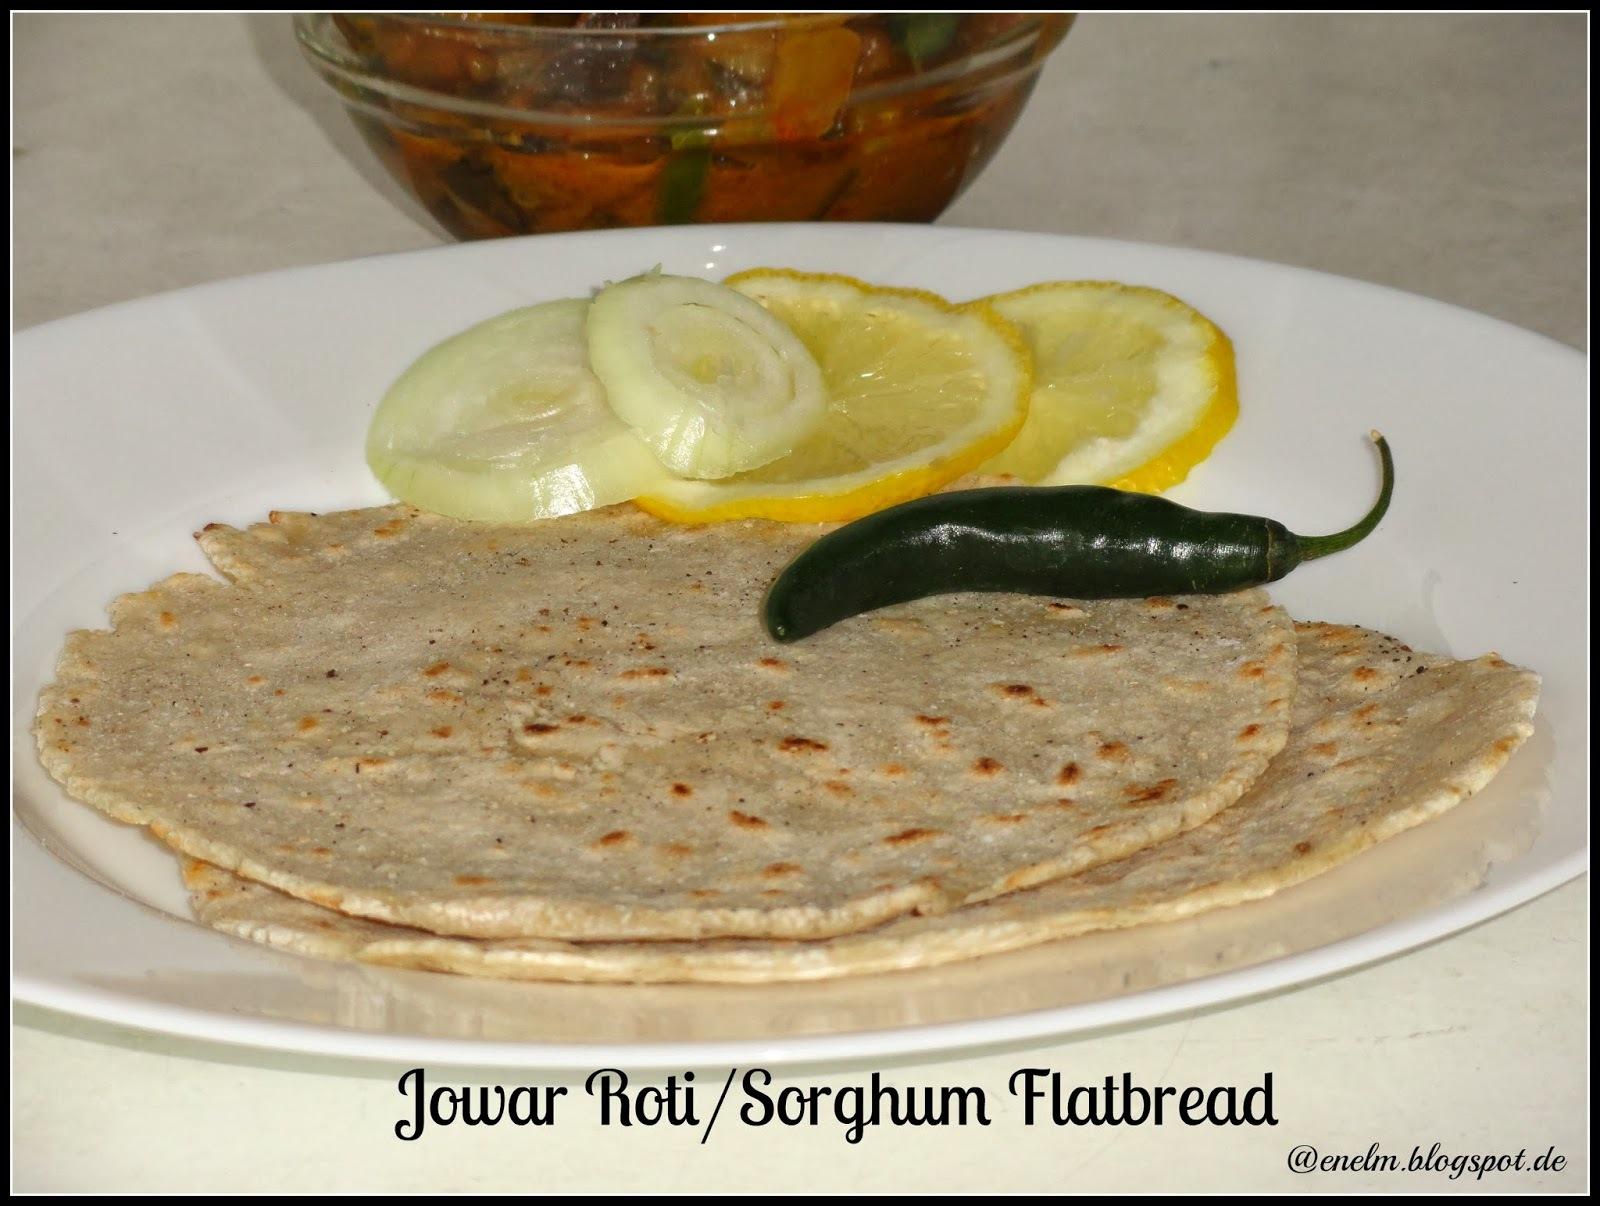 Jowar Roti/Jolada Rotti/Sorghum Flatbread